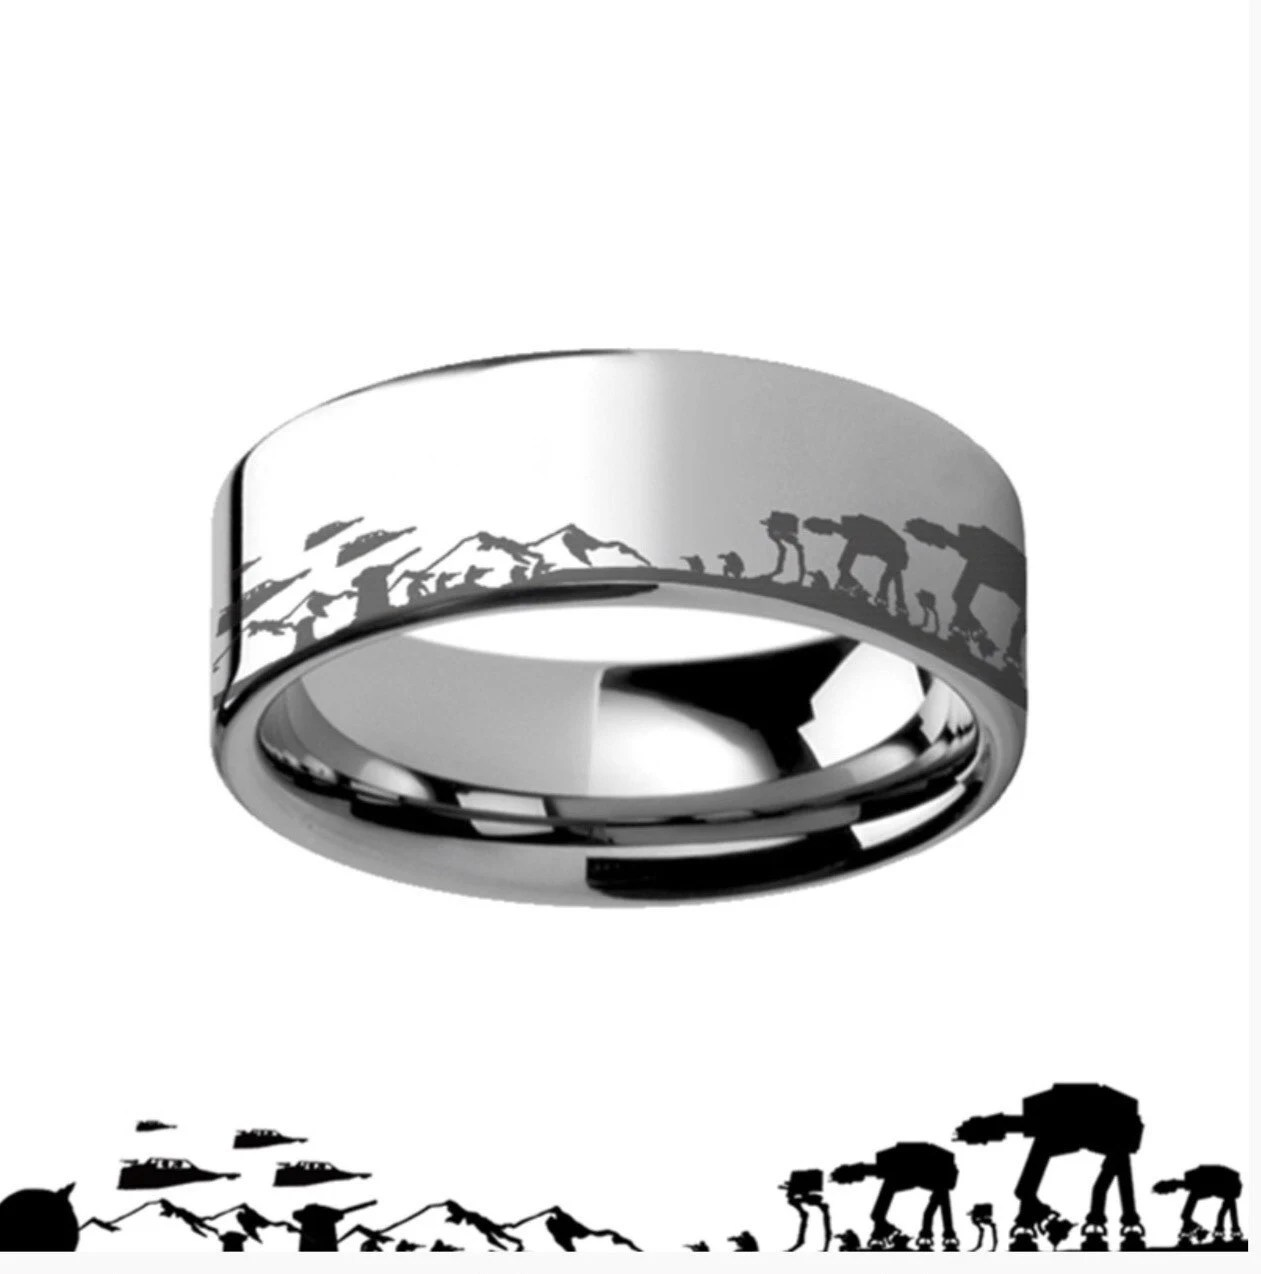 wedding ring star wars star wars wedding rings Wedding ring star wars